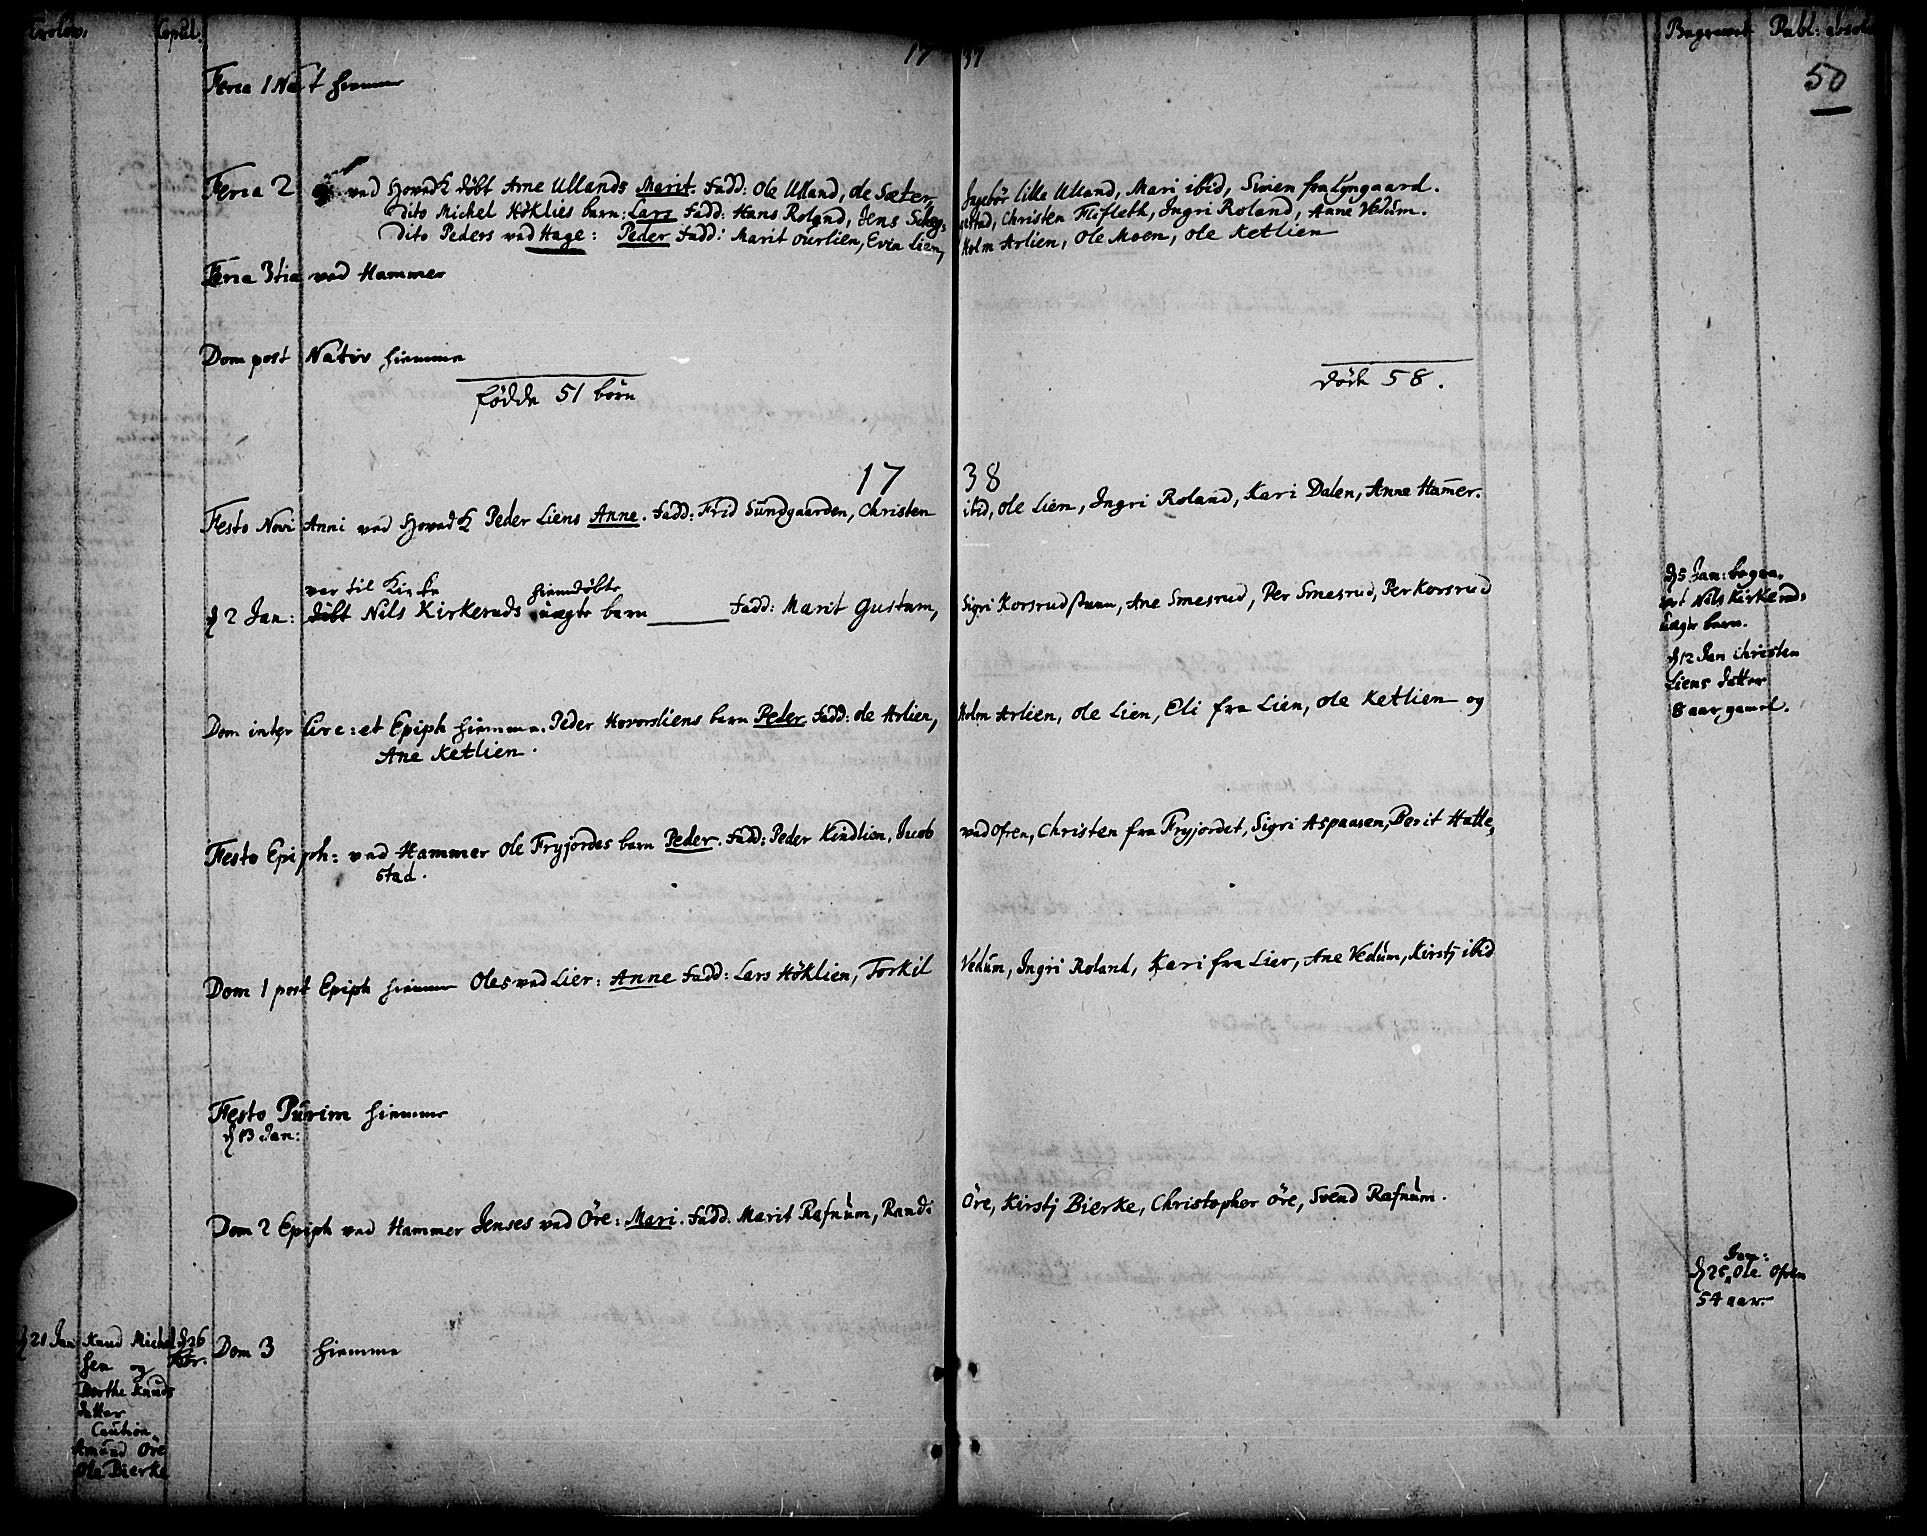 SAH, Fåberg prestekontor, Ministerialbok nr. 1, 1727-1775, s. 50